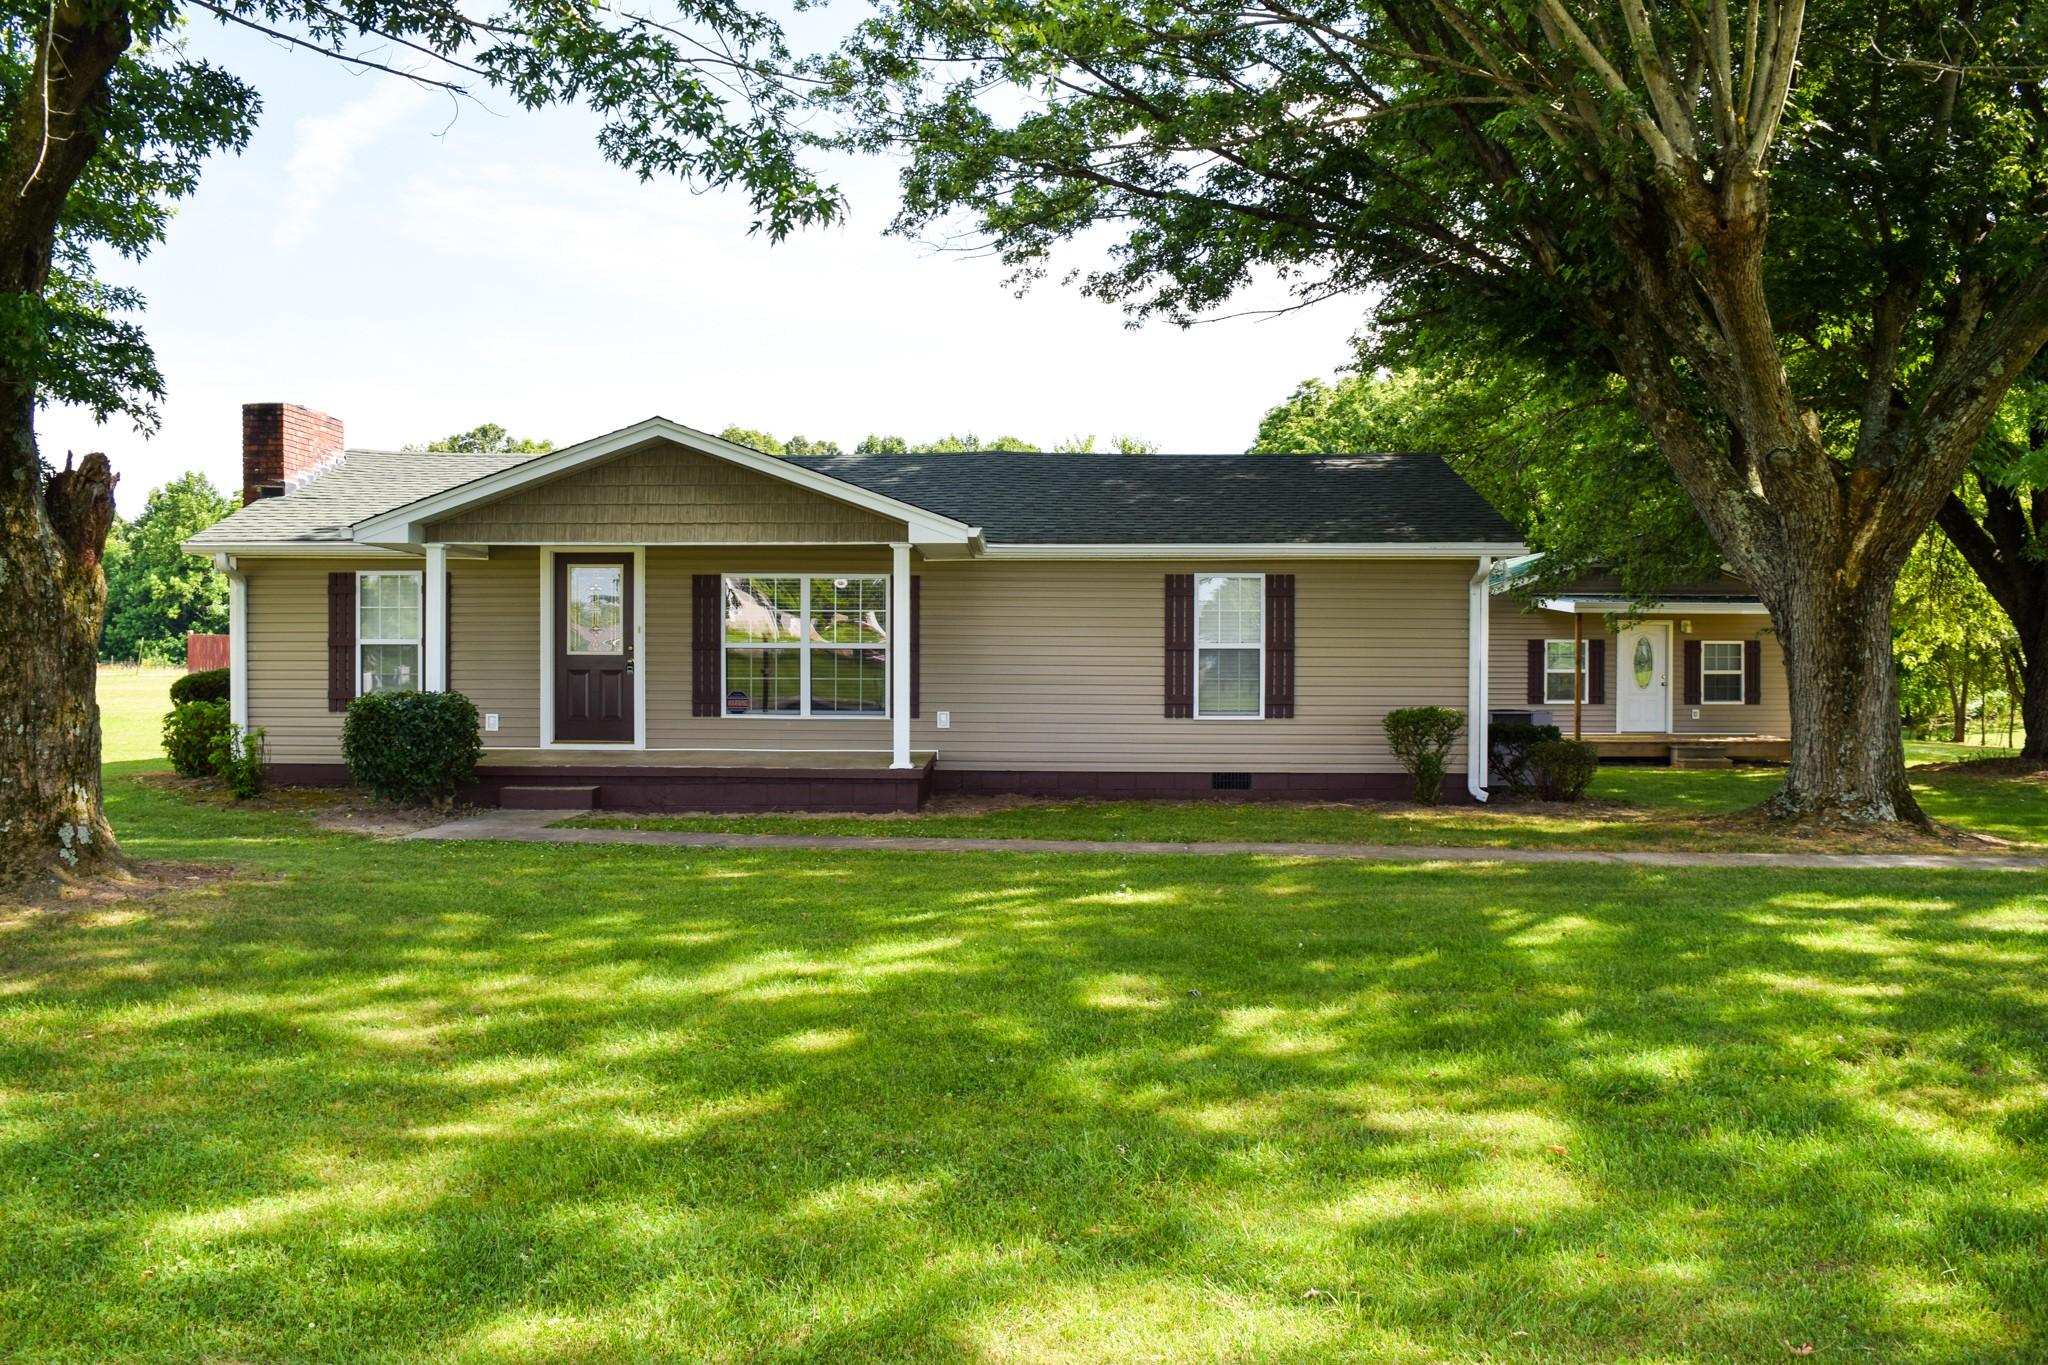 105 Old Martin Chapel Rd Property Photo - Portland, TN real estate listing